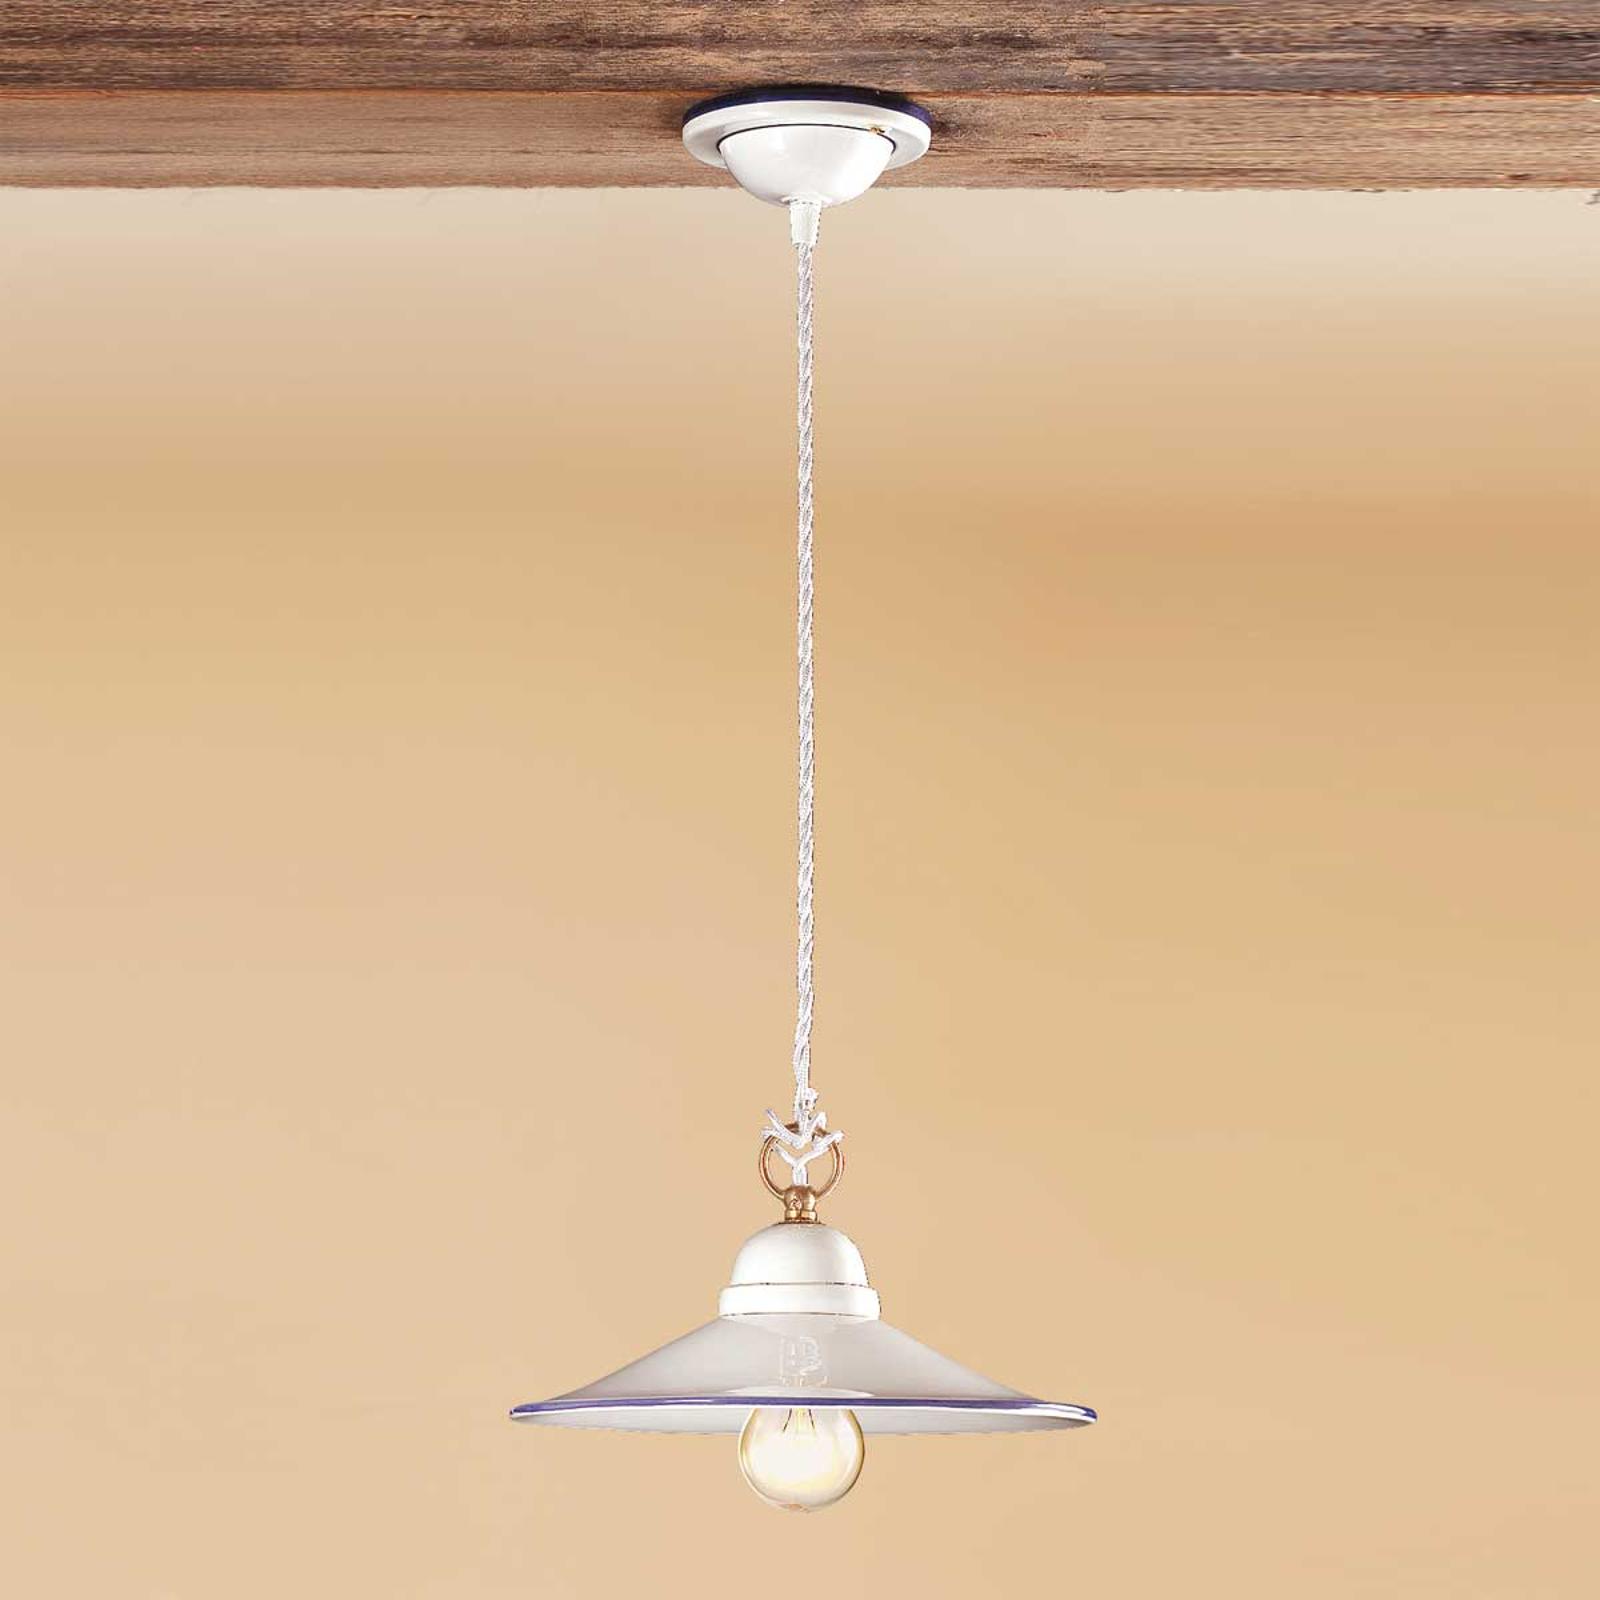 Mooie hanglamp PIATTO van keramiek